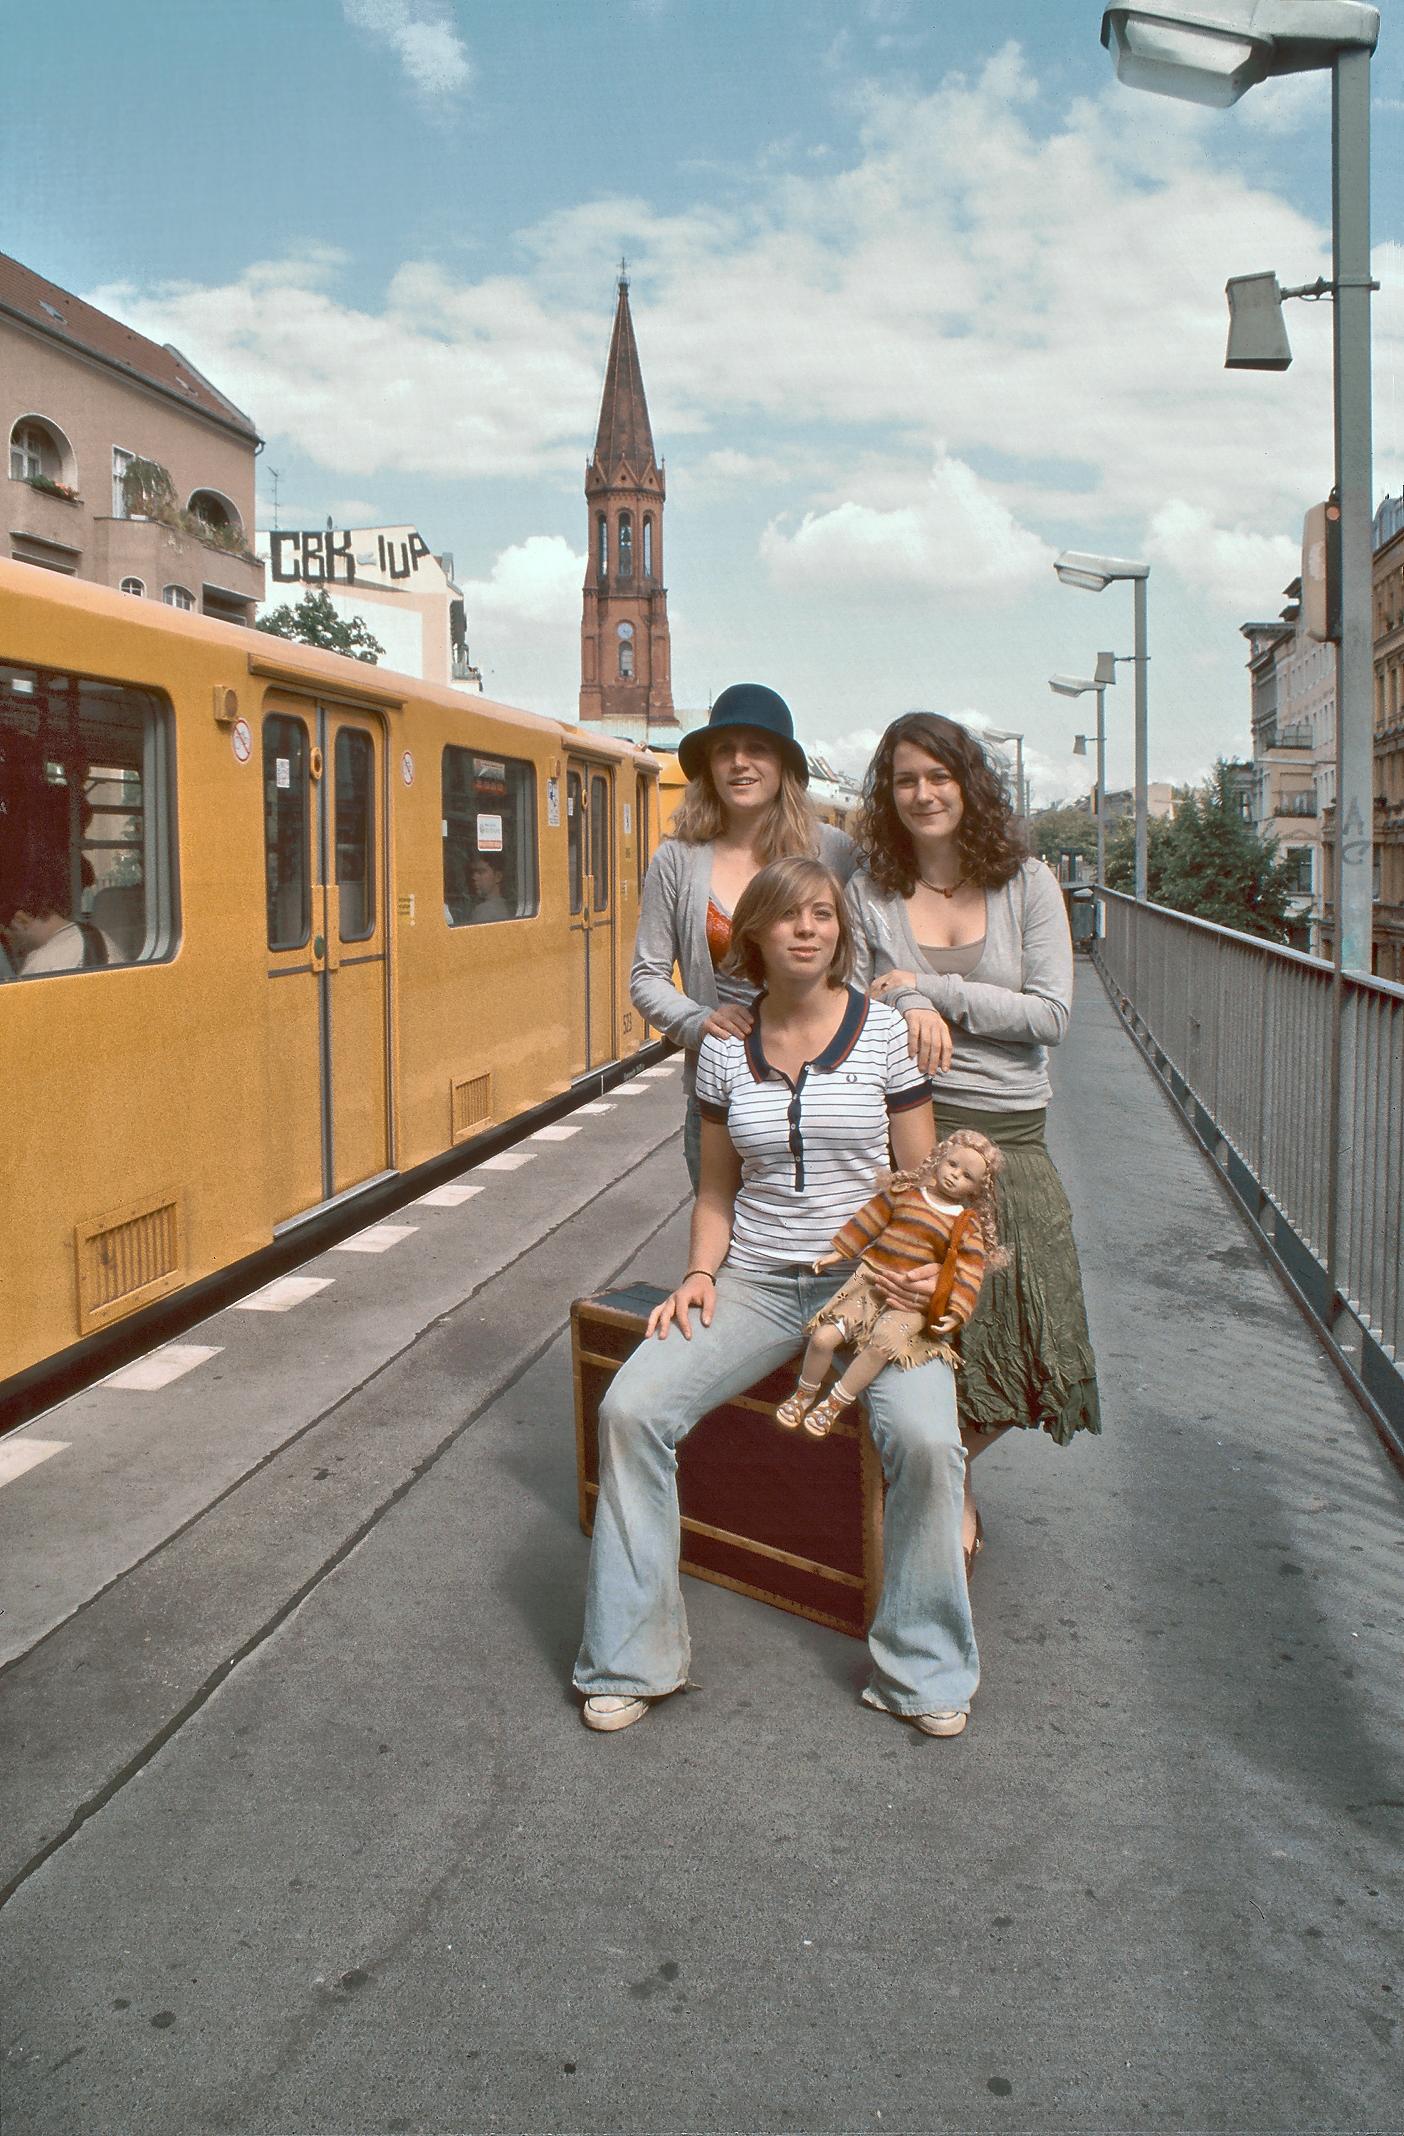 Hochbahnhof Görlitzer Bahnhof